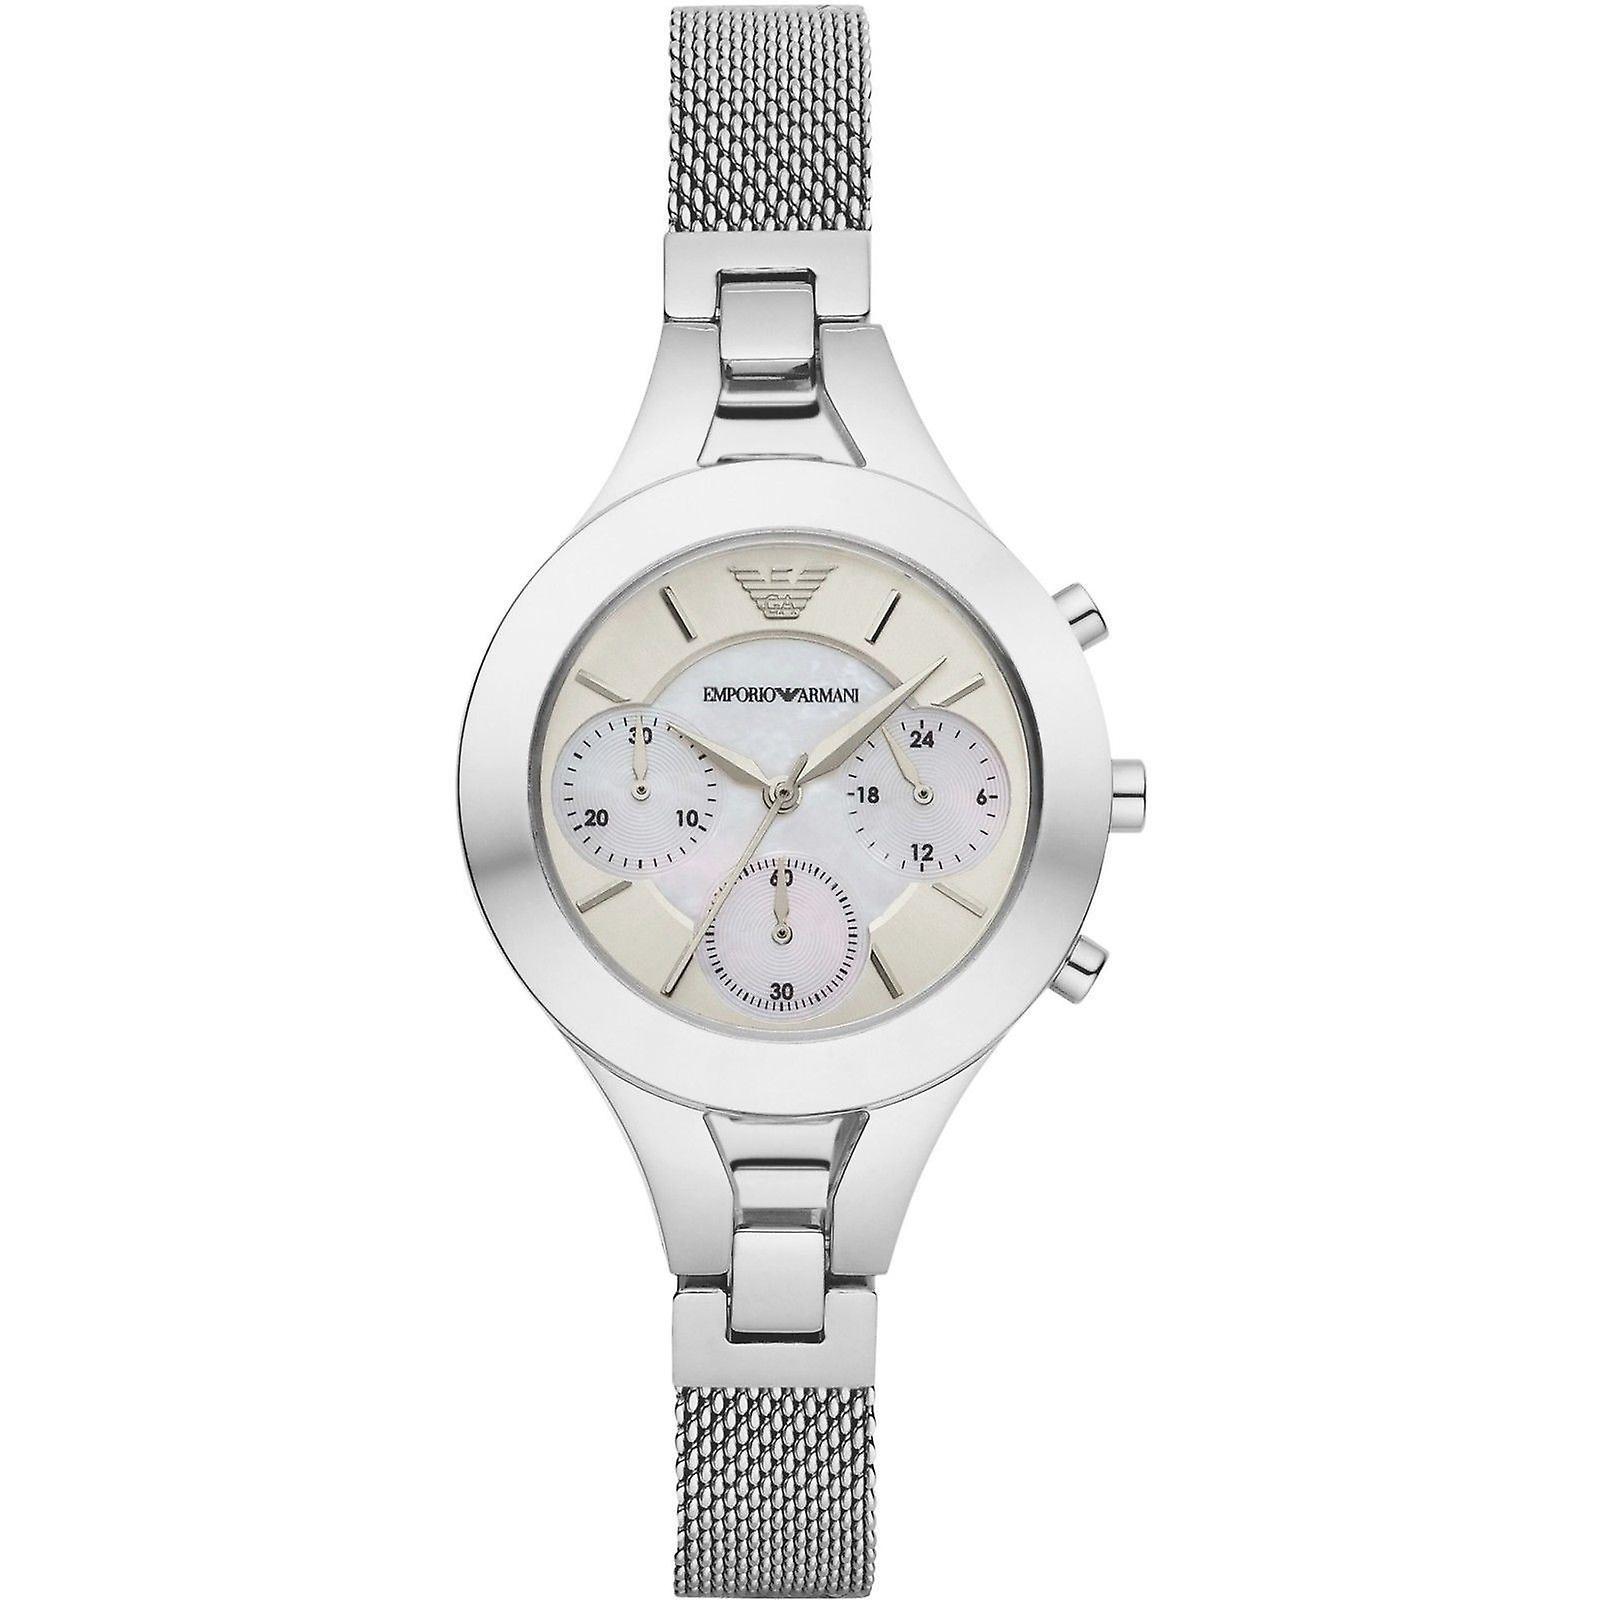 b0419171283b Emporio Armani para mujeres Señoras Cronógrafo pulsera reloj acero  inoxidable AR7389